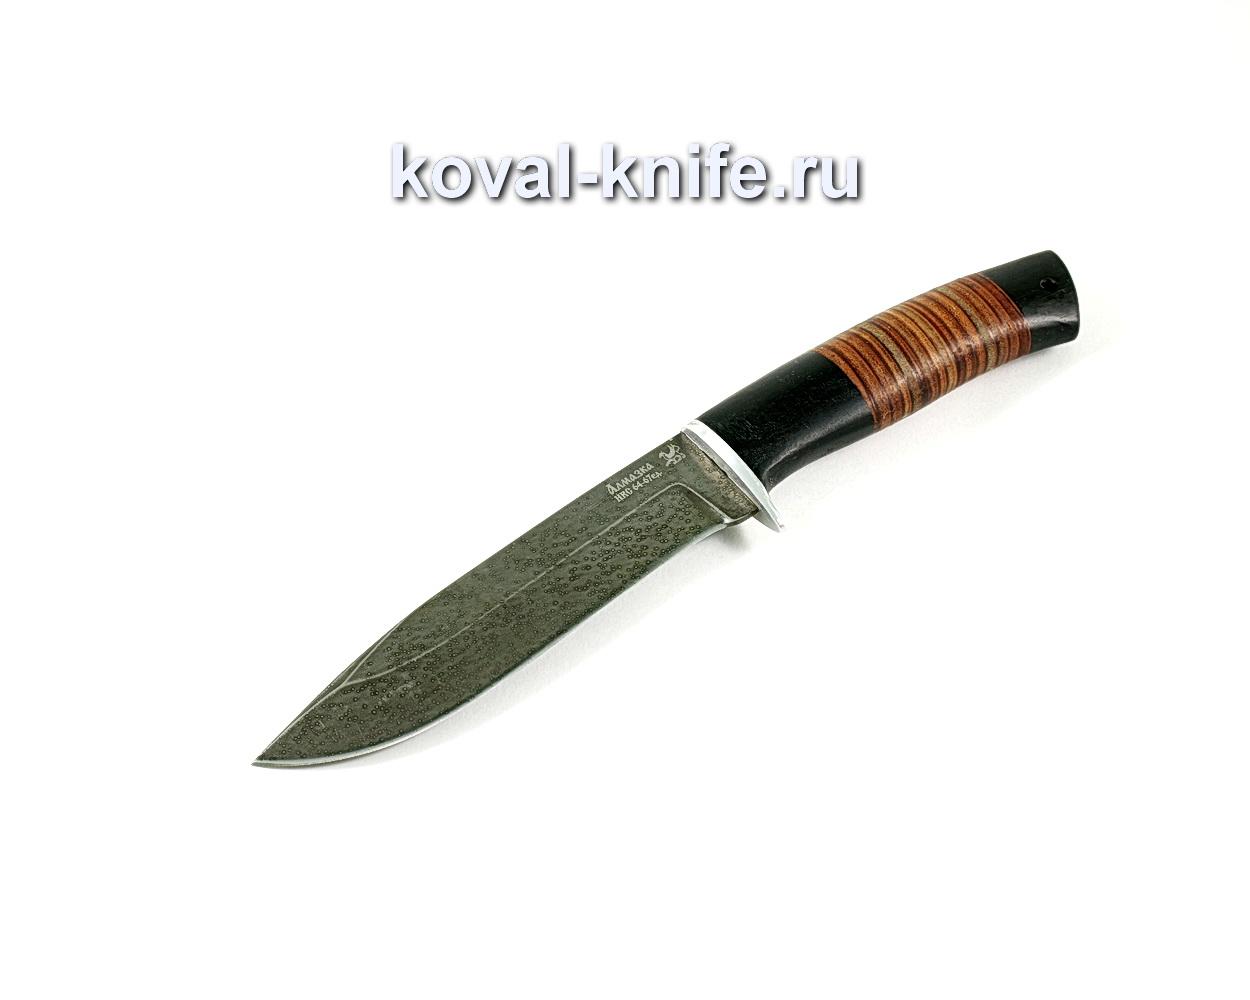 Нож Олимп (сталь ХВ5-Алмазка), рукоять граб, кожа A291